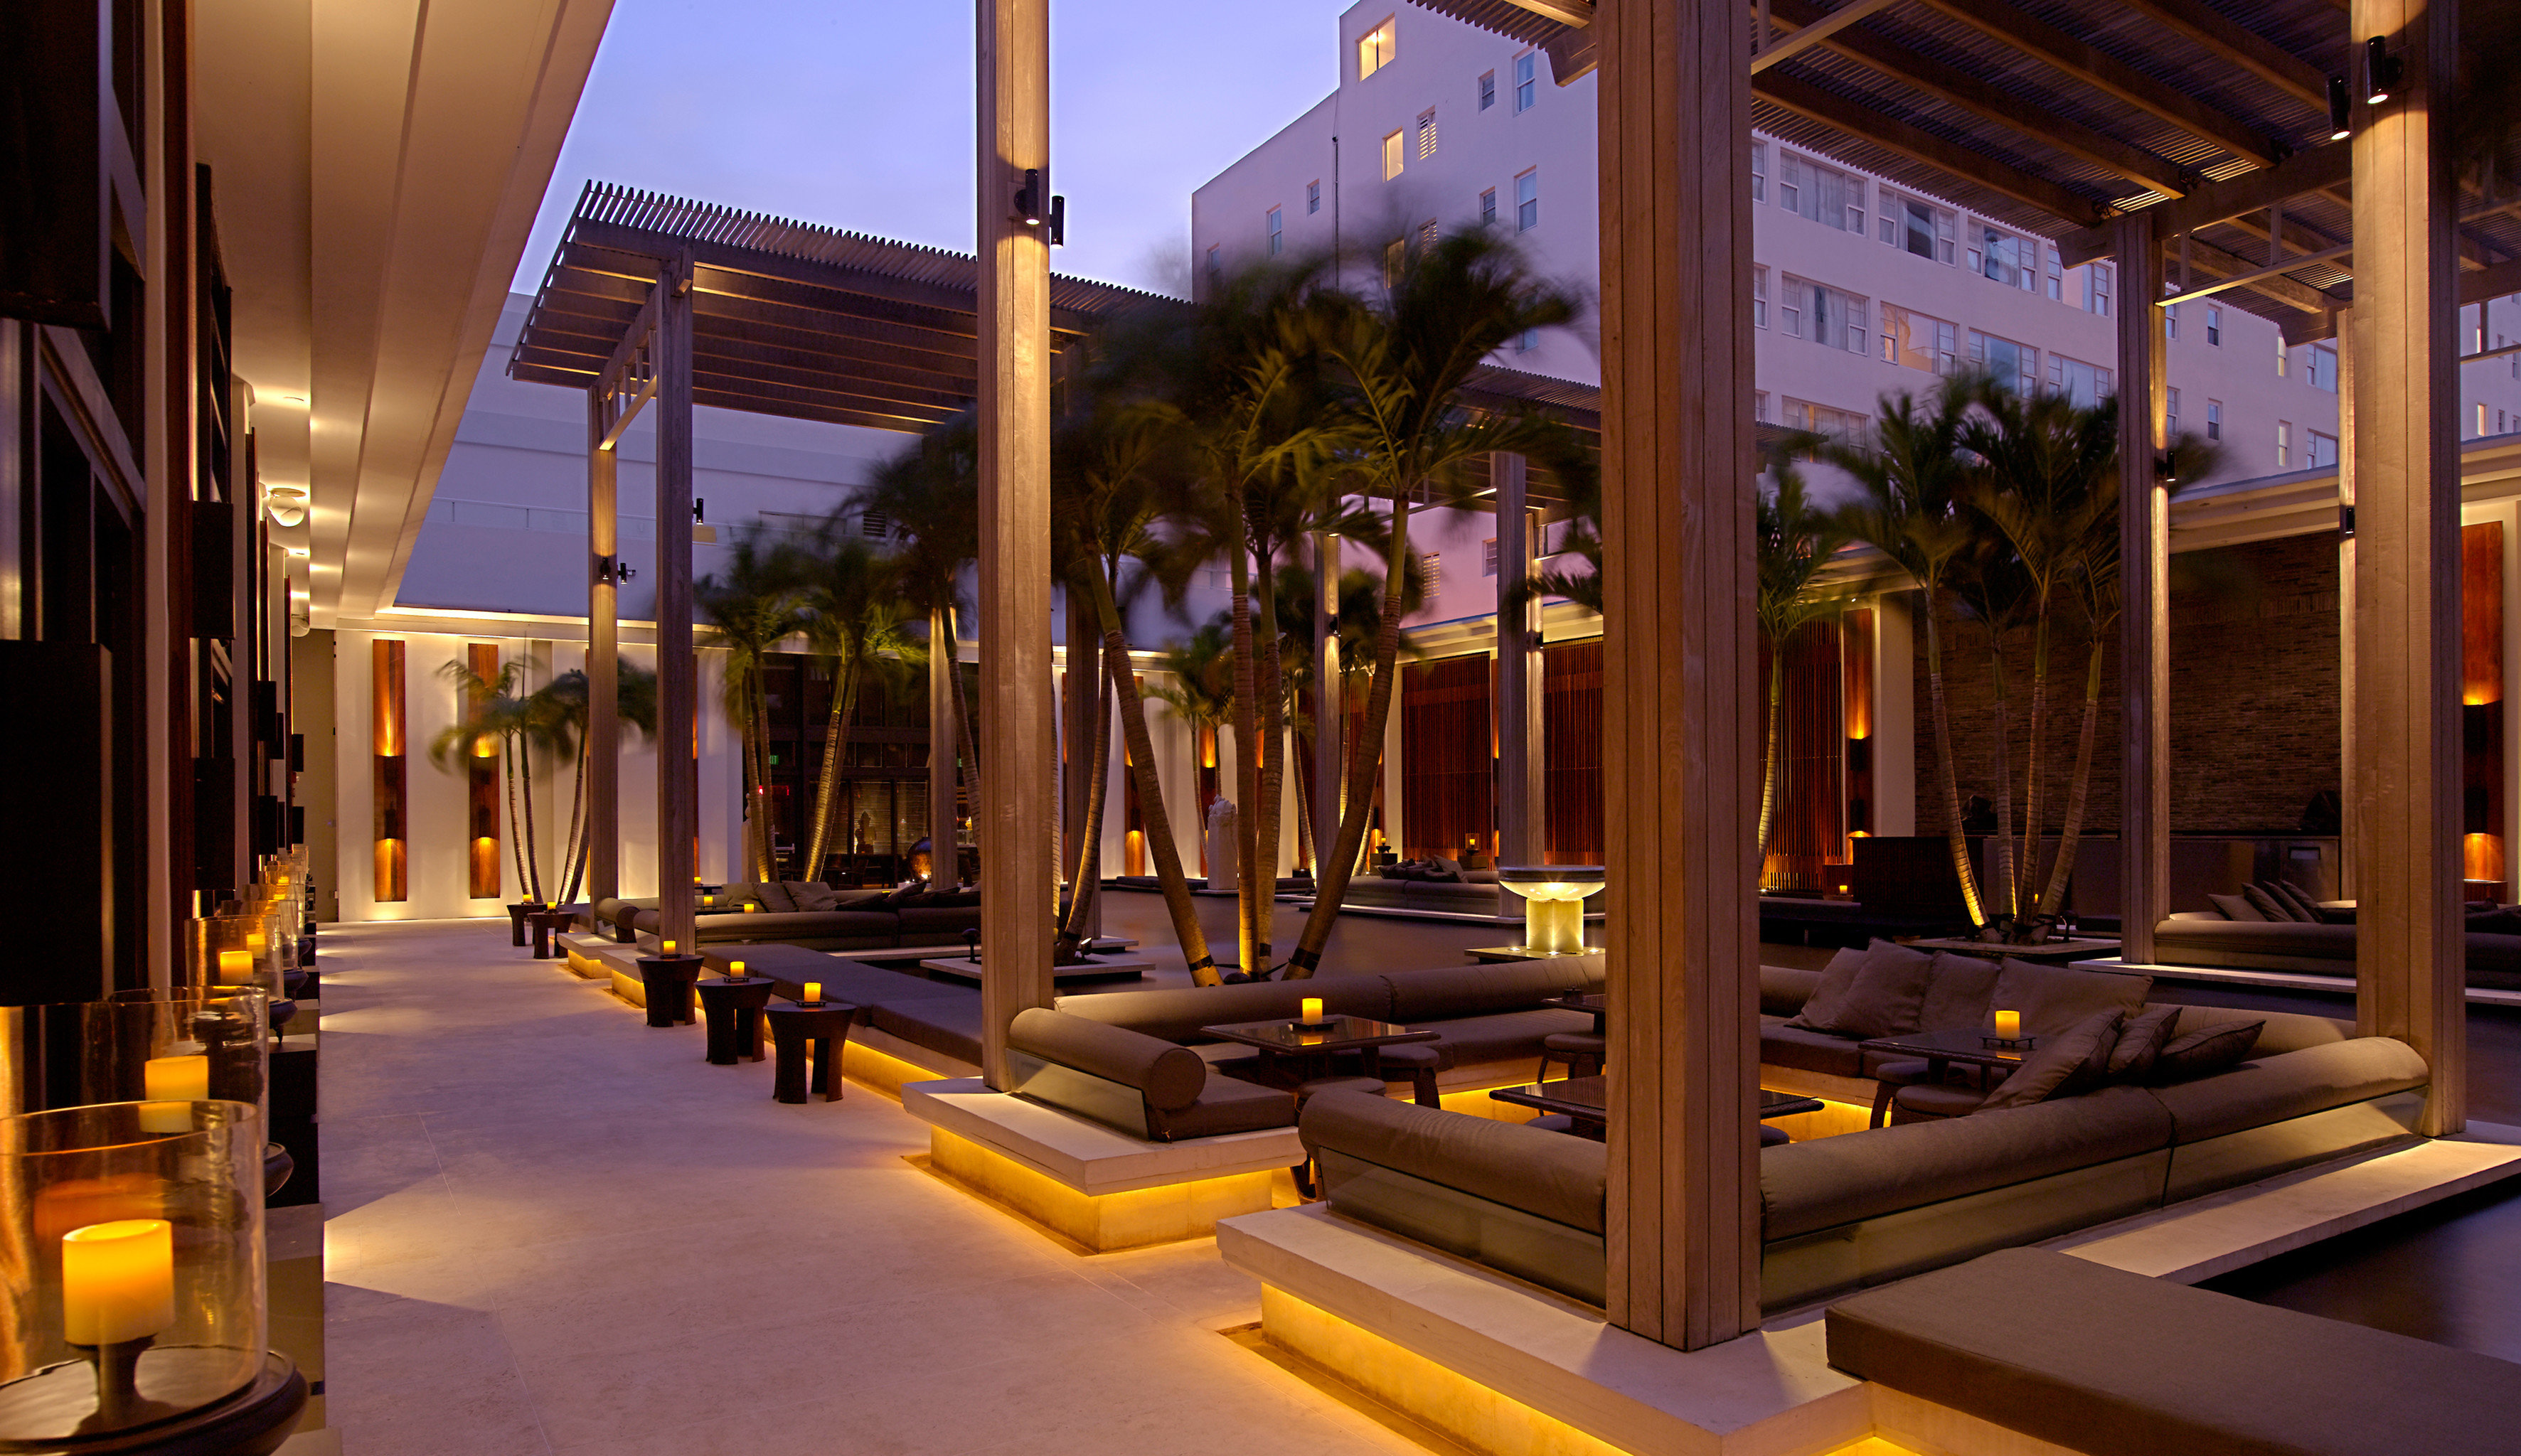 Lounge Luxury Party structure building Resort light lighting restaurant night